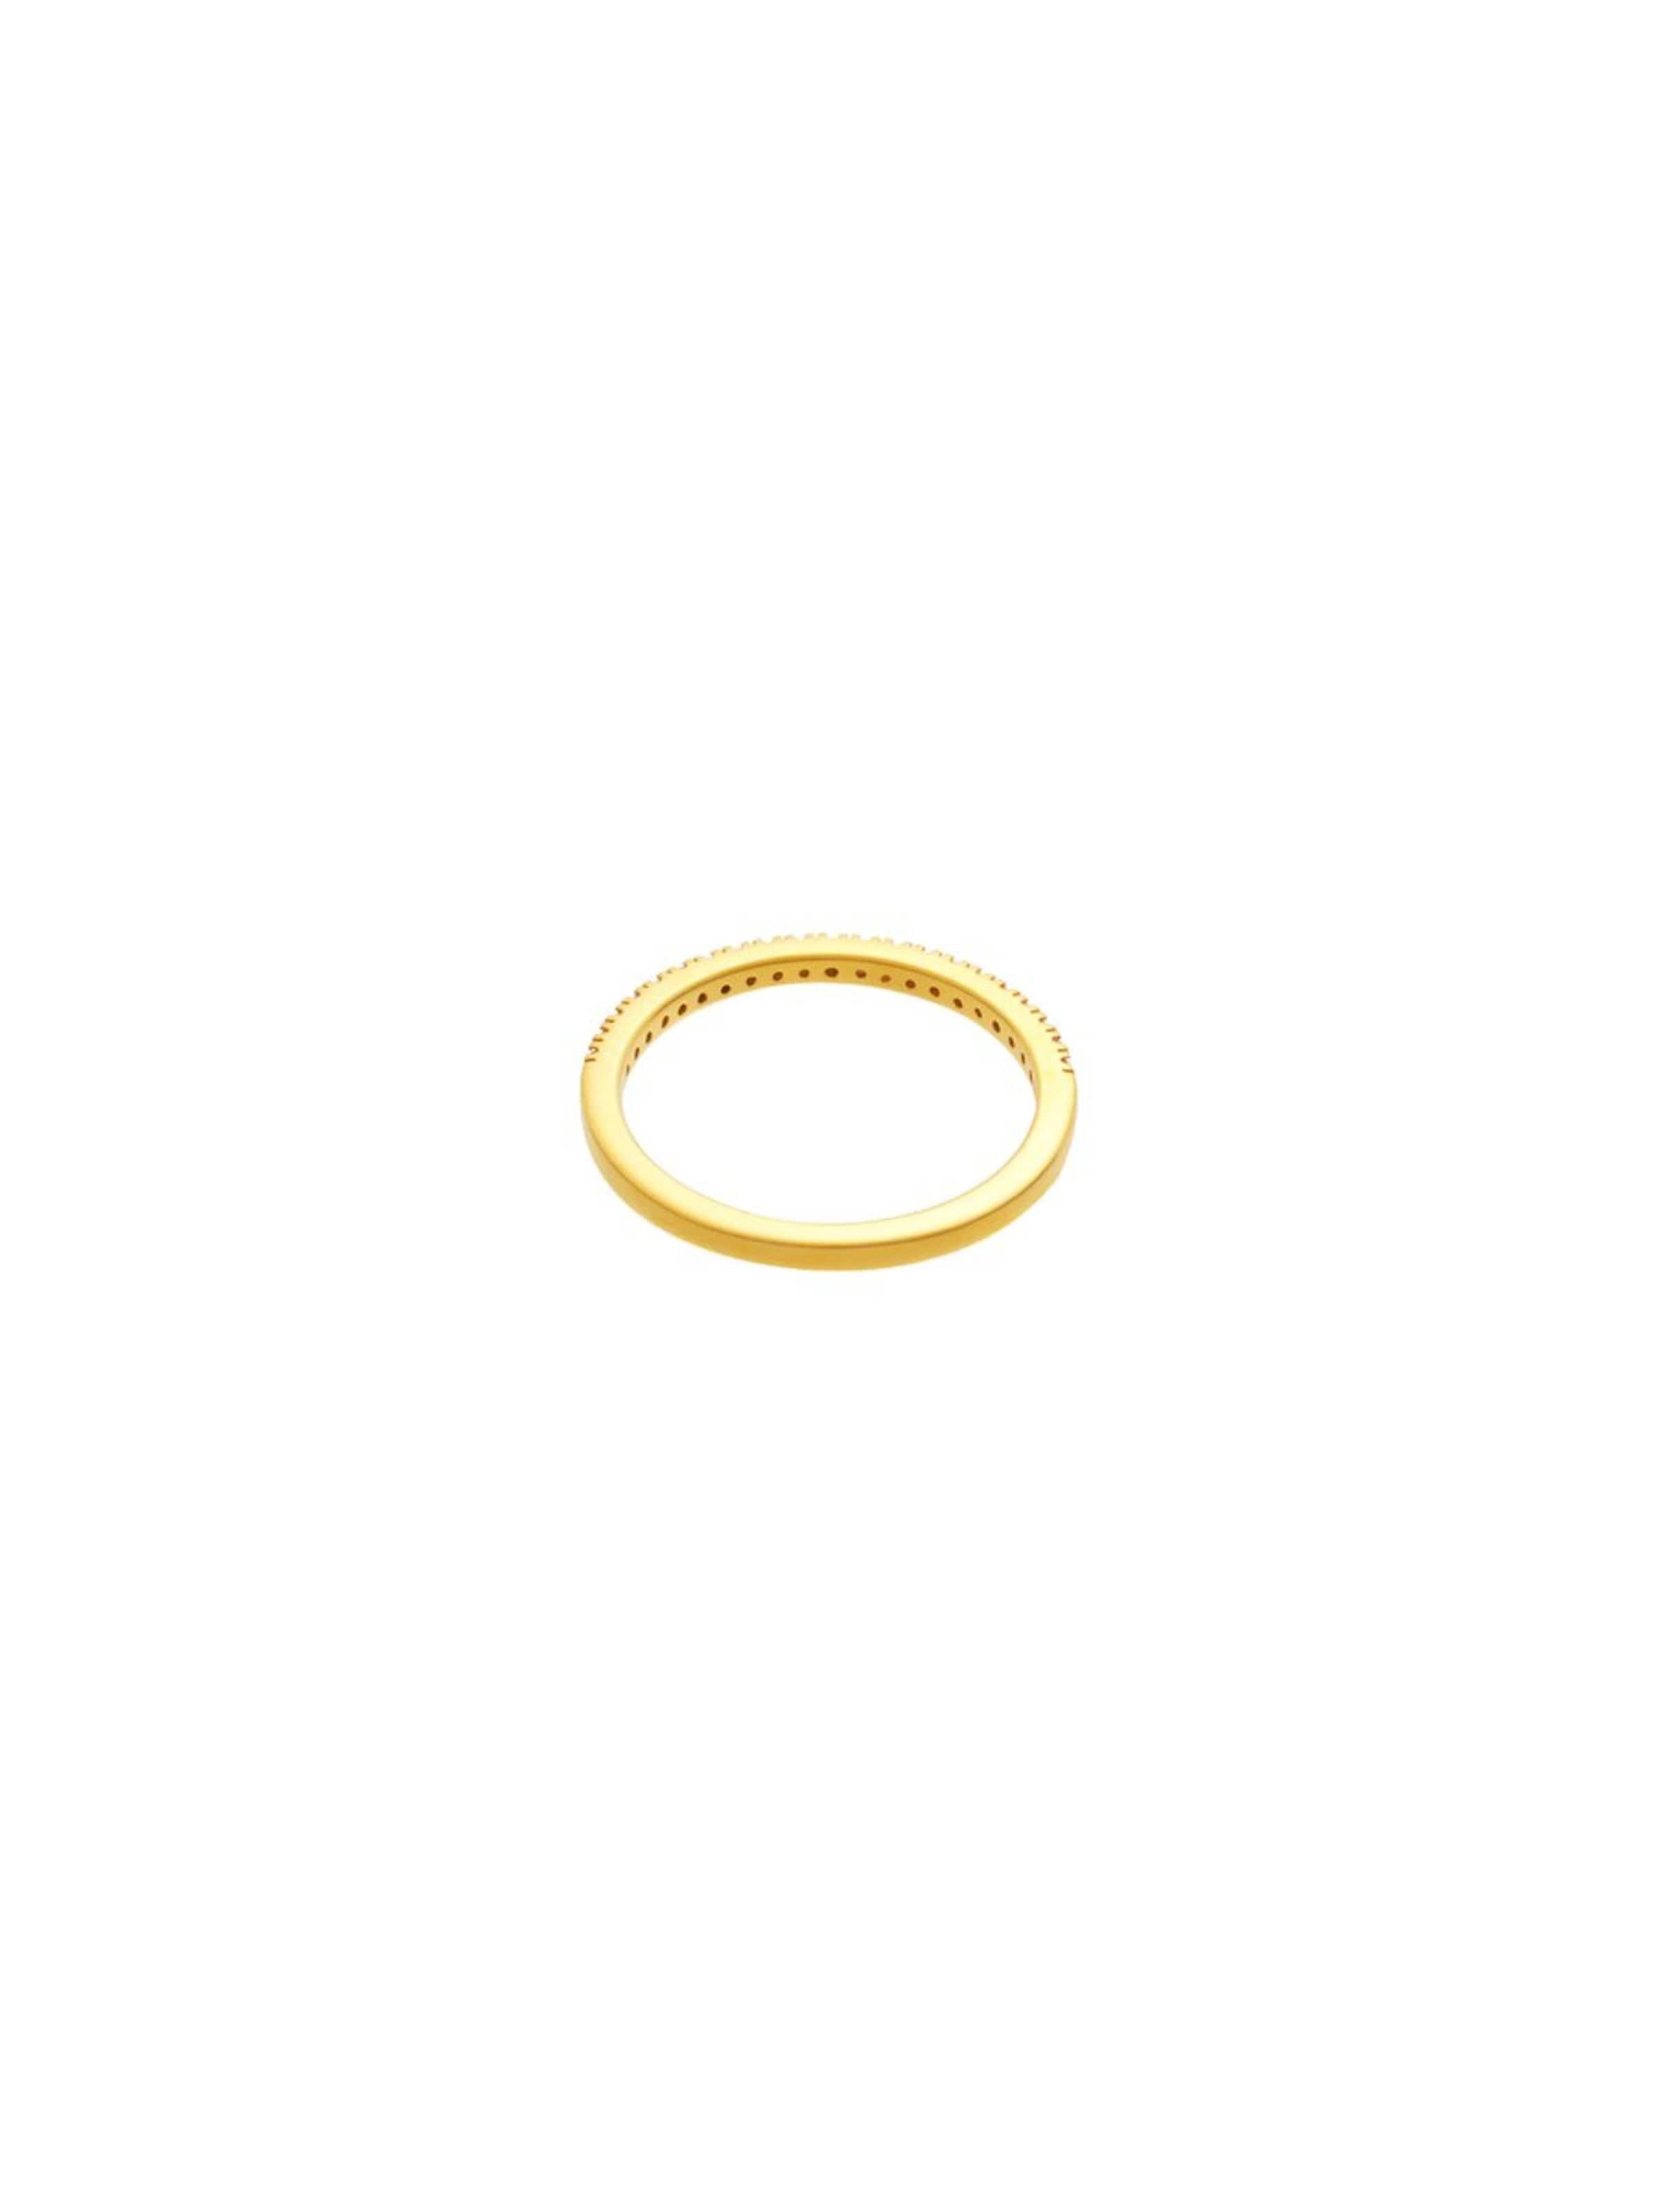 HellblauGold Simplicity' Id Fine 'blue In Ring QdeCxroWB